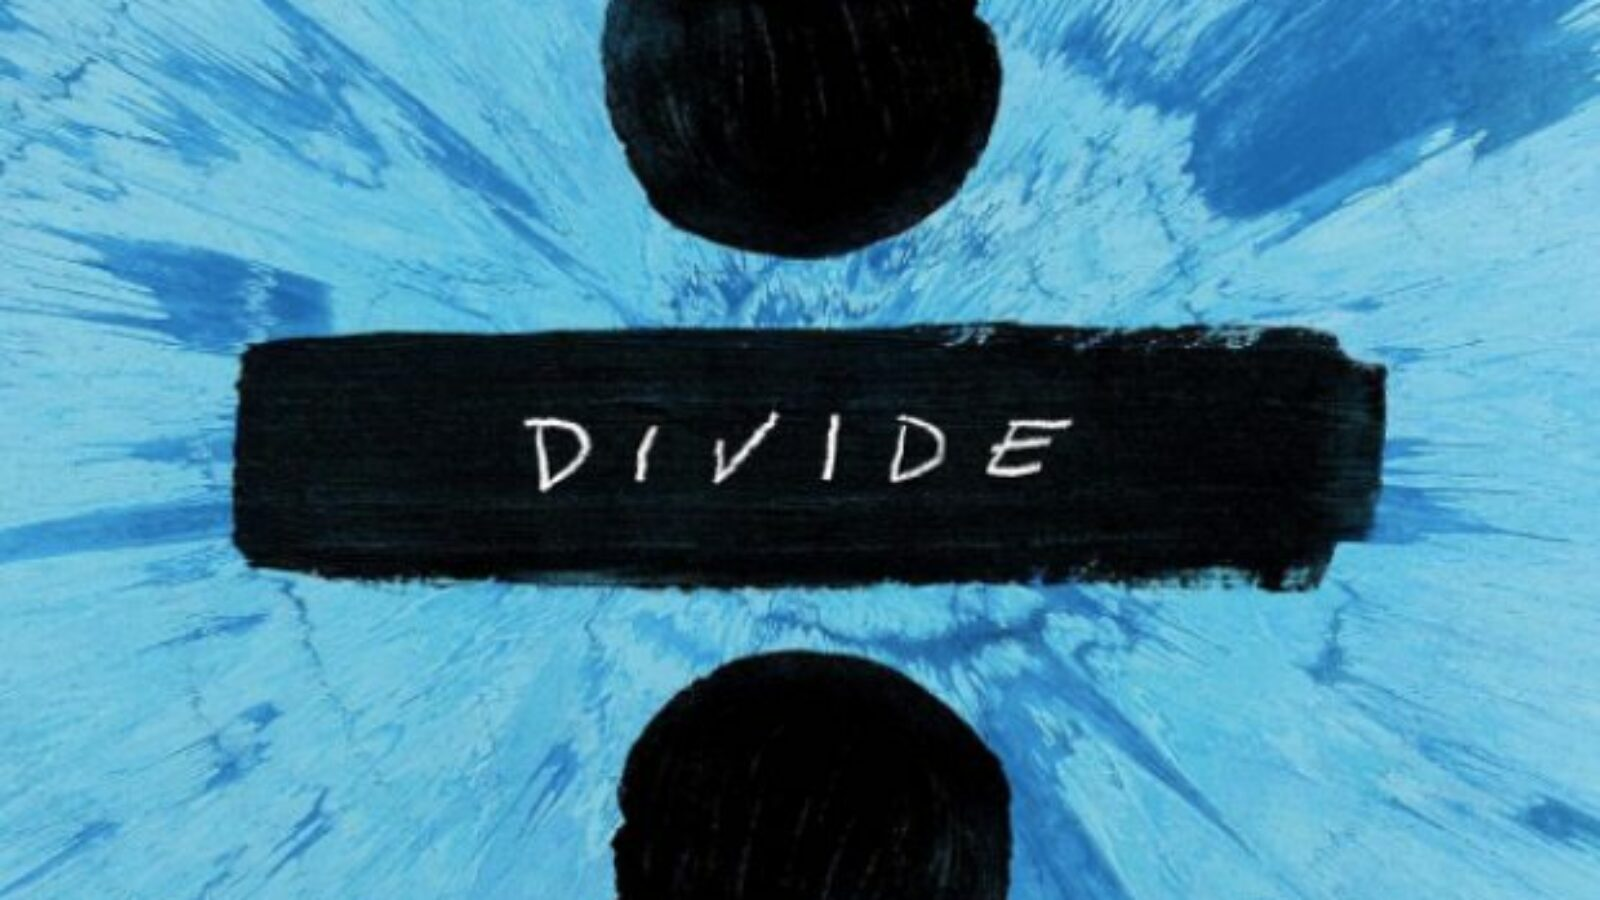 OXMOX CD-Tipp: ED SHEERAN – ÷ (Divide)